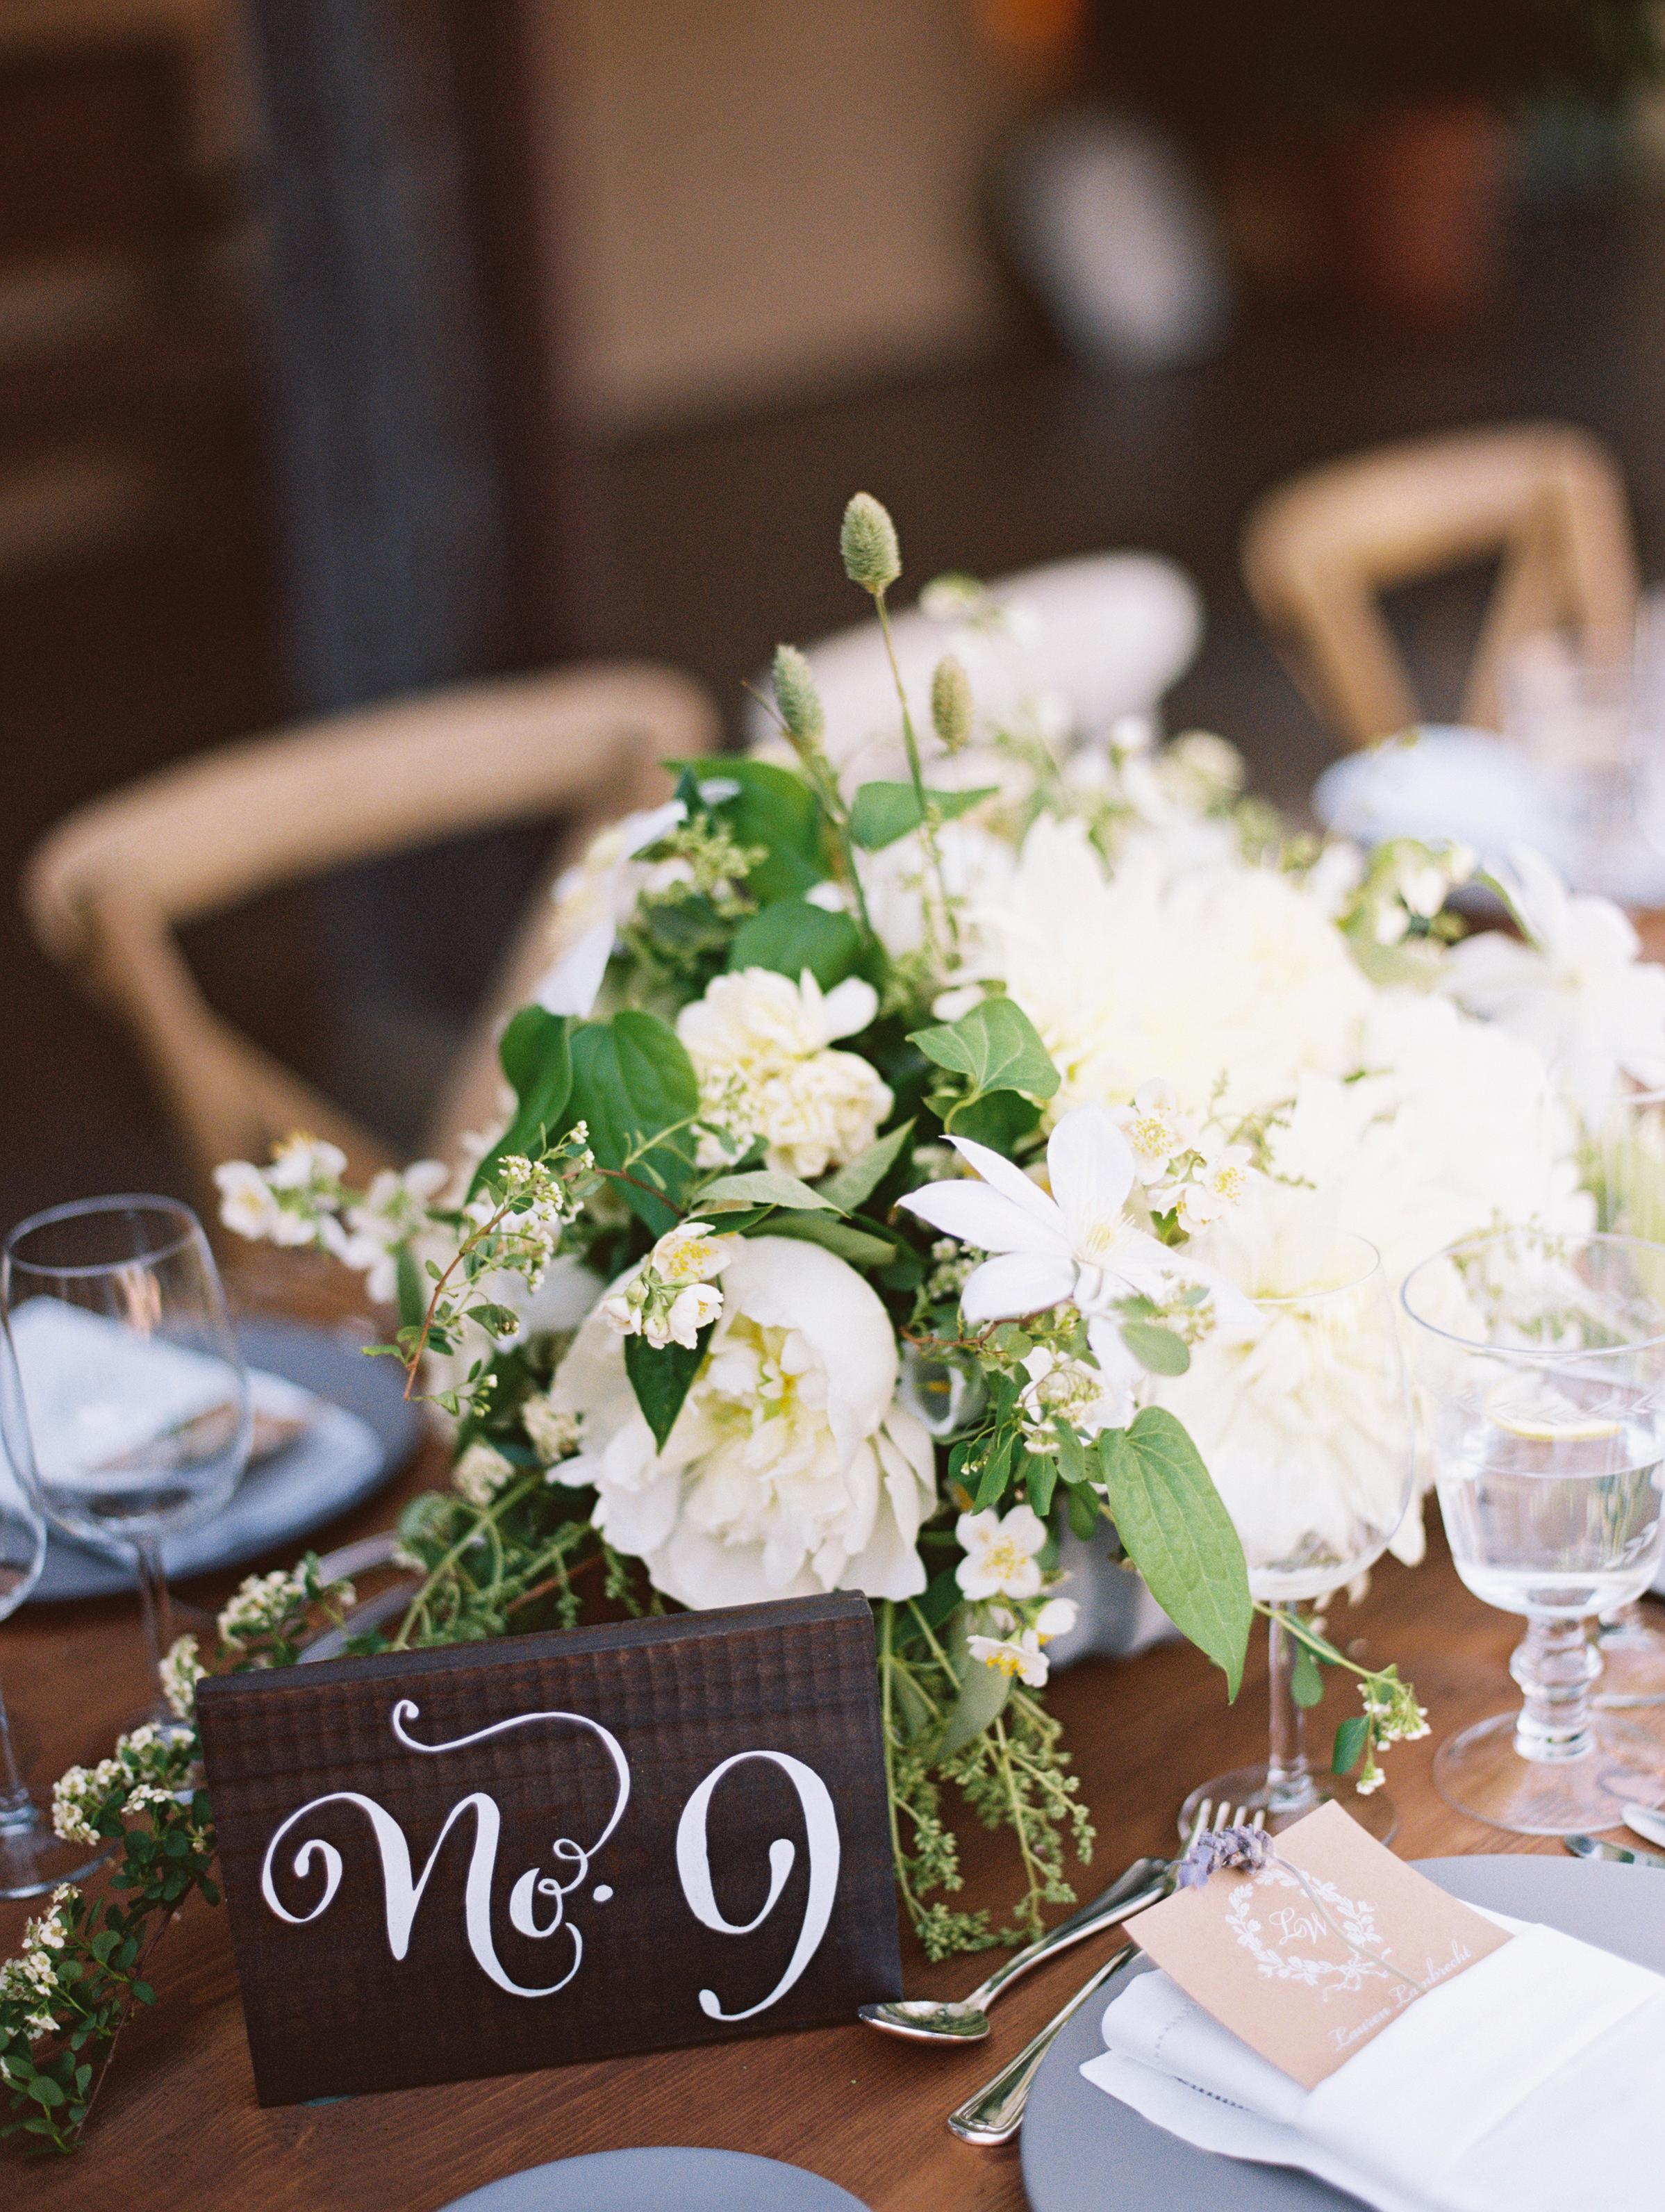 www.santabarbarawedding.com | Pat Moyer Wedding Photography & Films | Santa Barbara Historical Museum | Magnolia Weddings | Camiella Floral Designs | Reception Table Numbers